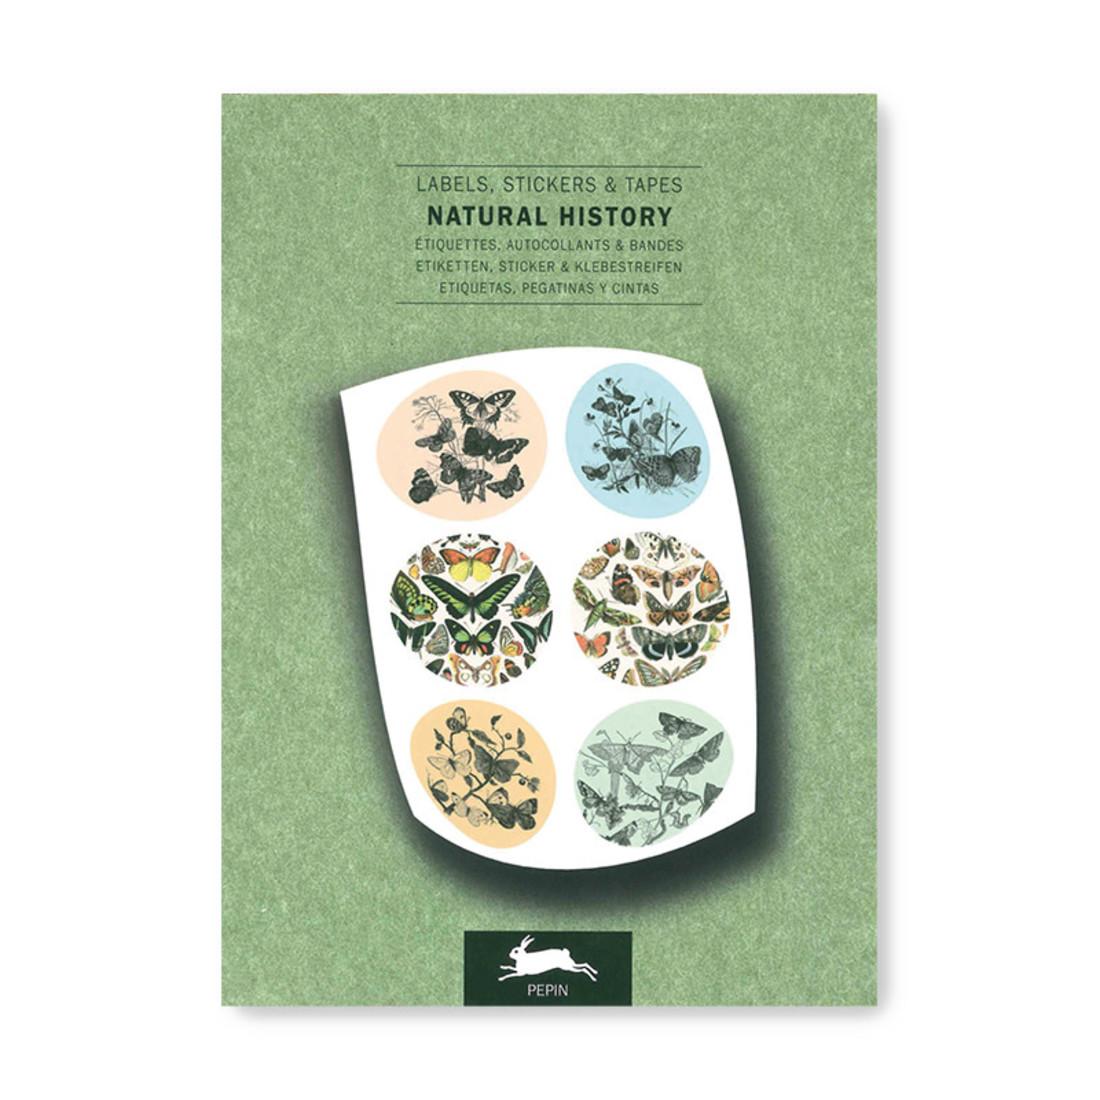 Pepin Label & Sticker Book - Natural History